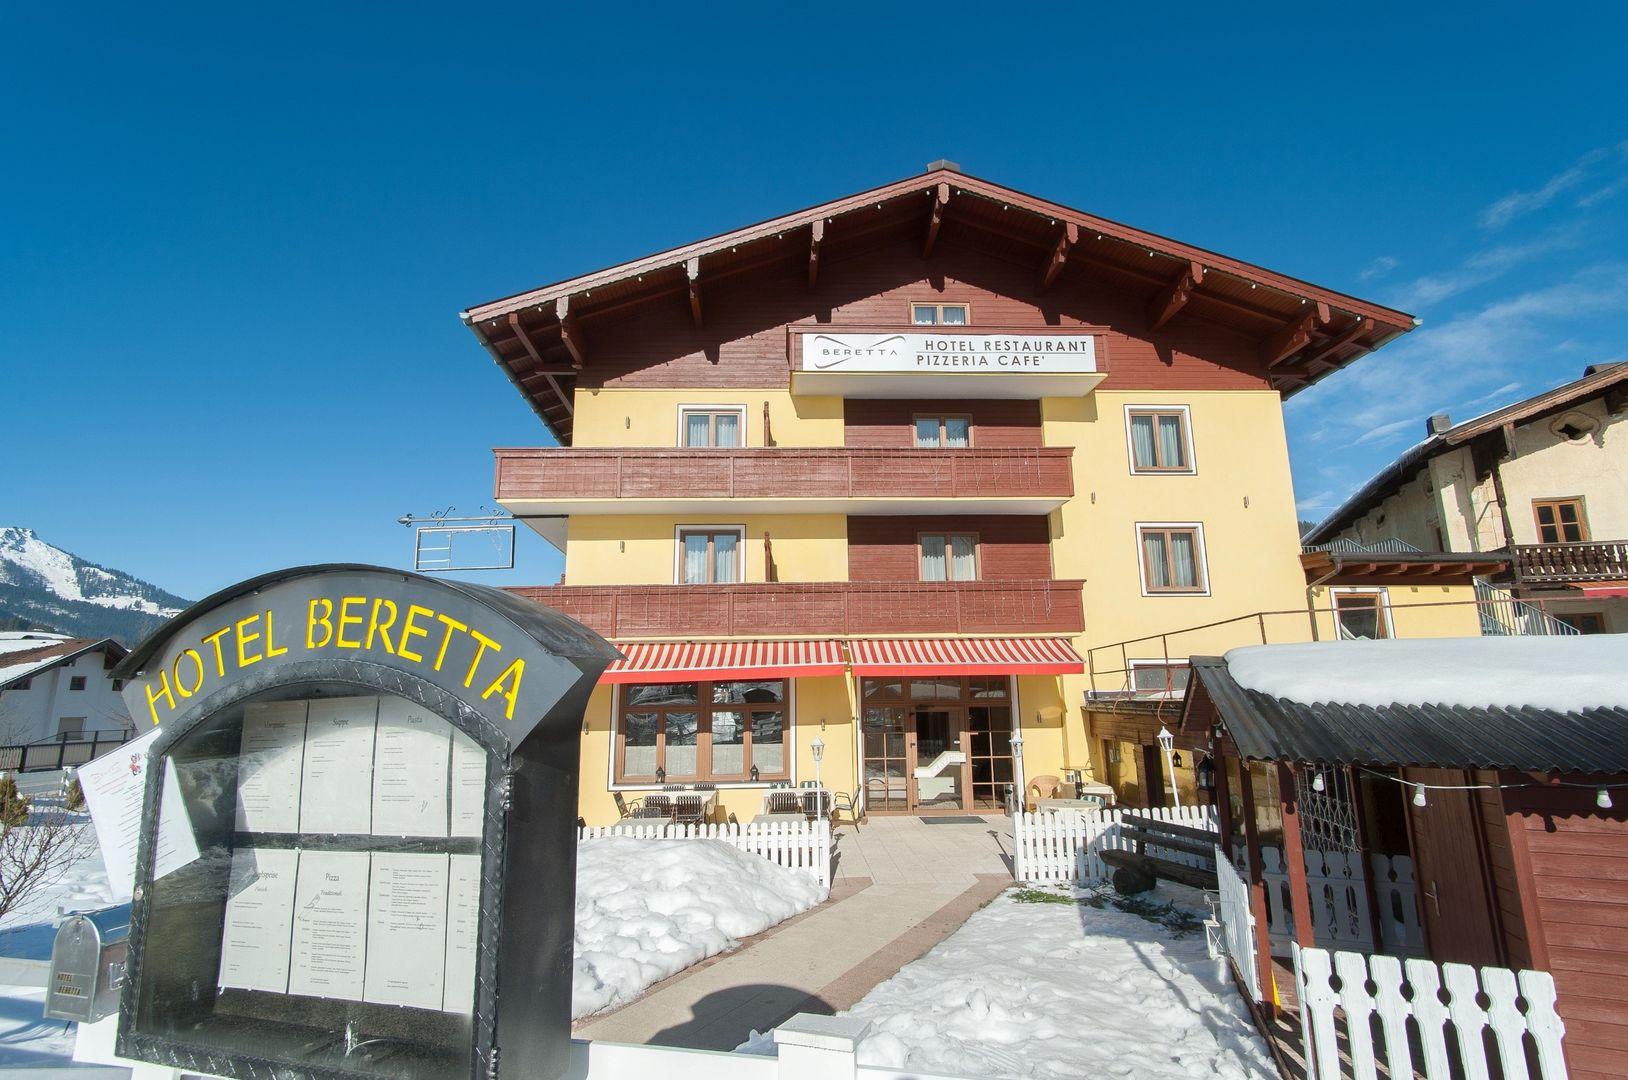 Hotel Beretta - Slide 1